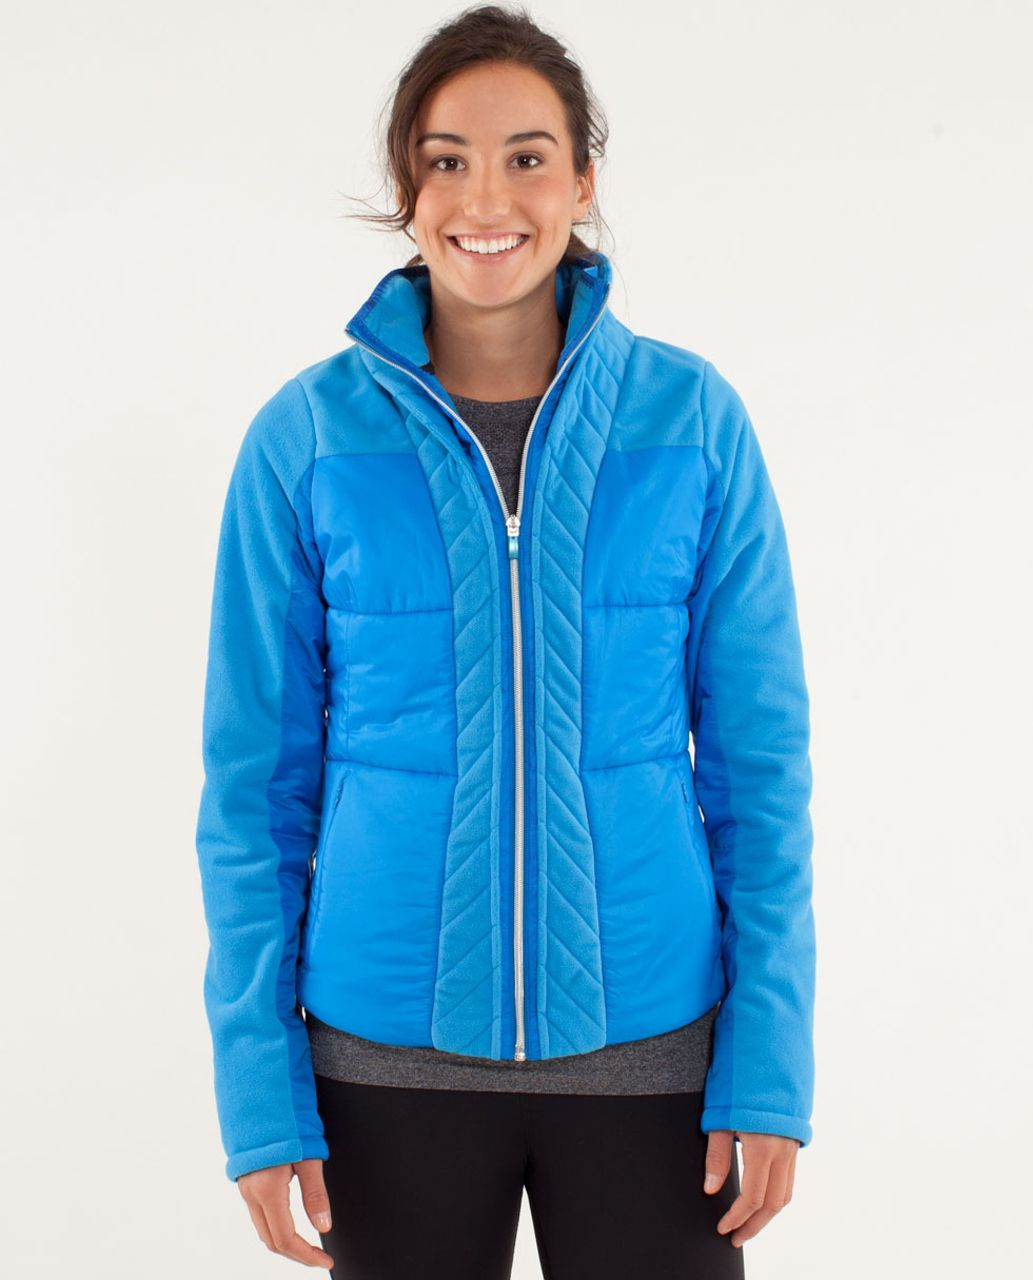 356d3f455d567 Lululemon St Moritz Jacket - Beaming Blue - lulu fanatics